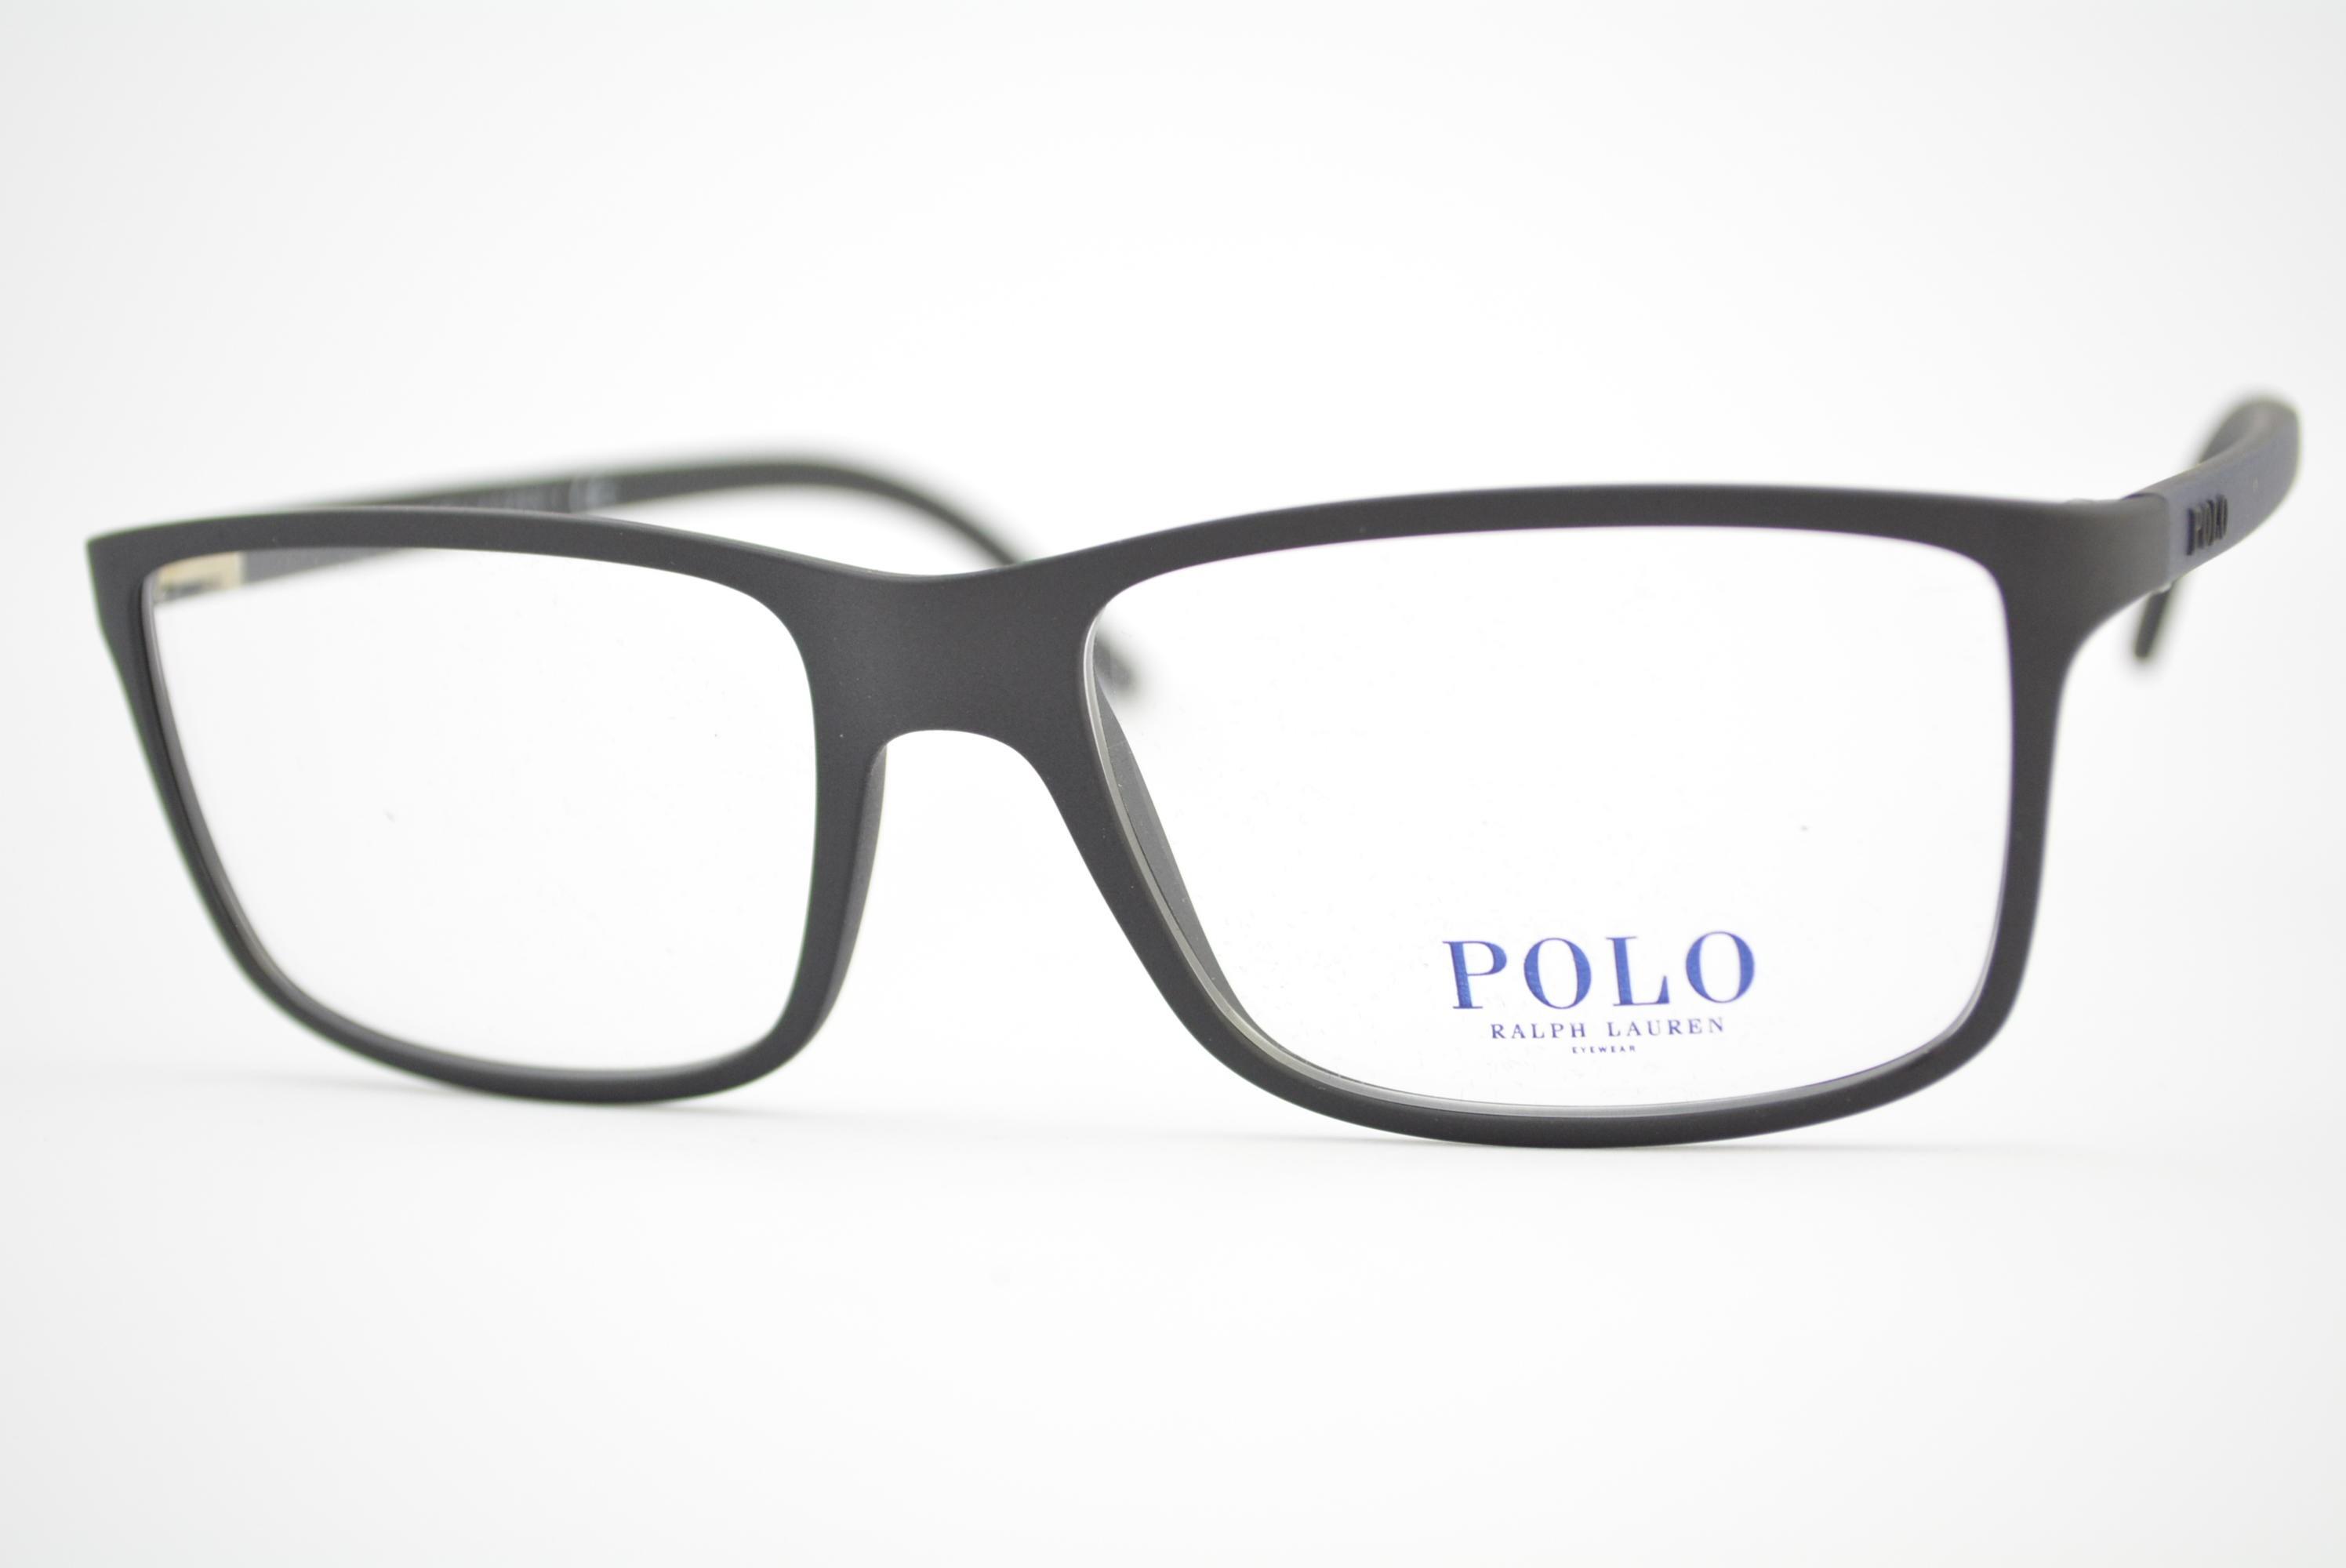 Preço De Oculos Polo Ralph Lauren - SIS Solutions f8384510c5